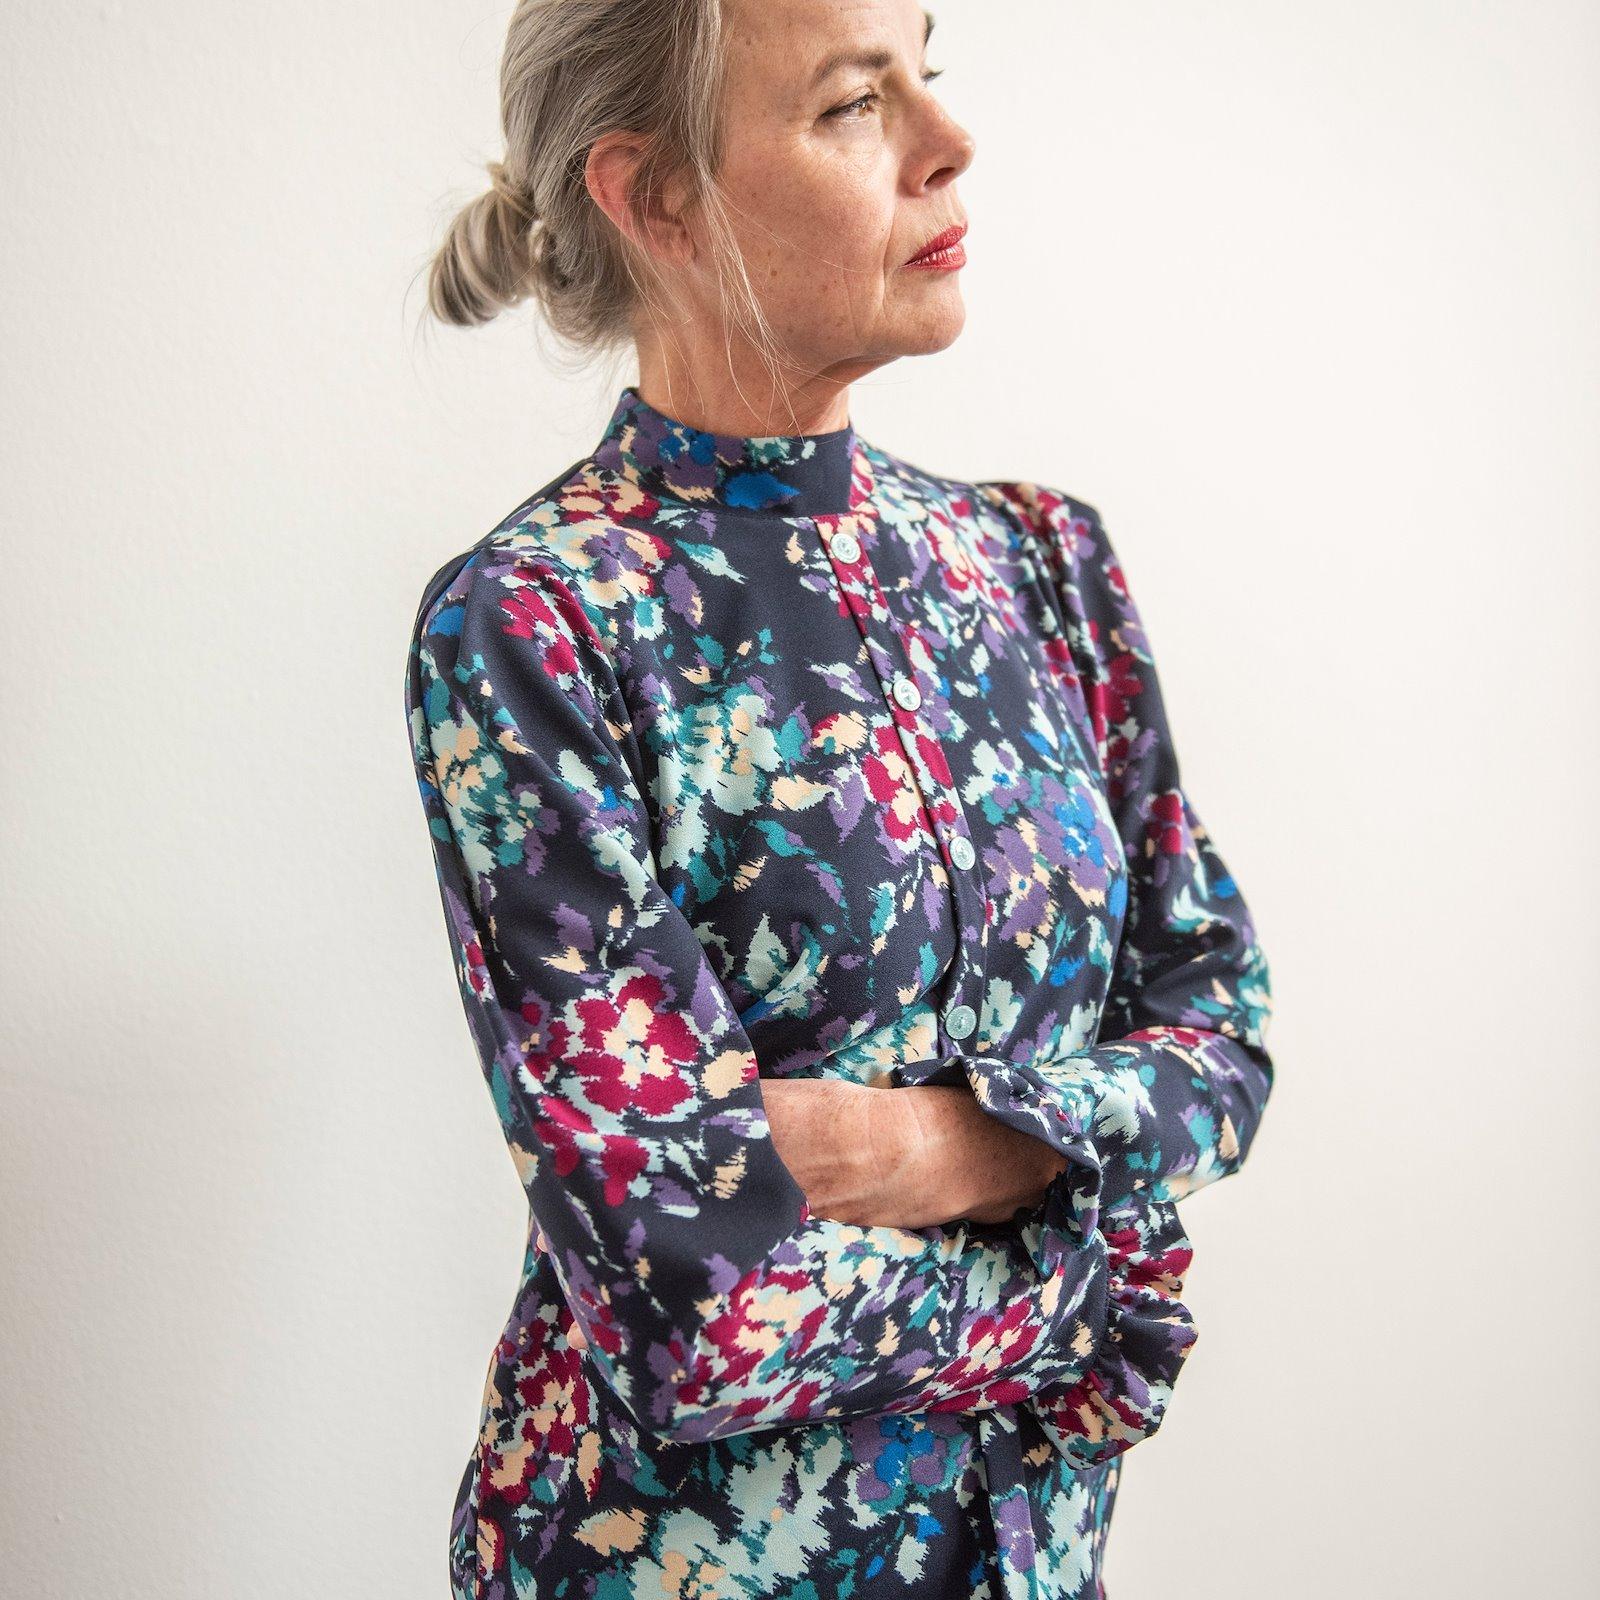 Design your own blouse p22075_560266_sskit